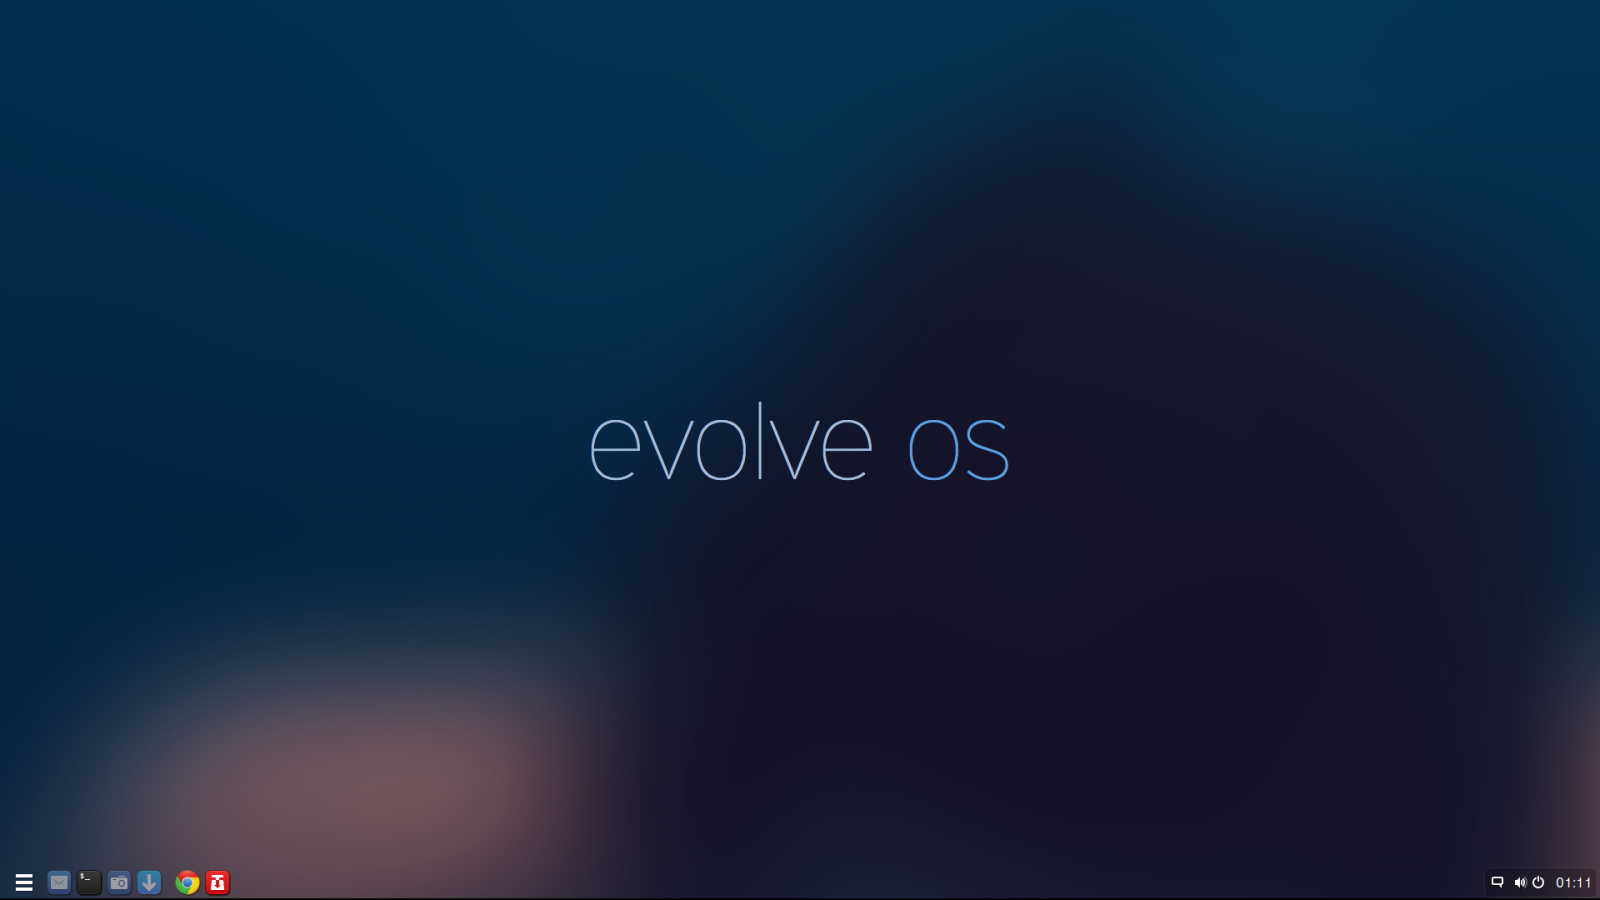 Evolve OS Beta 1